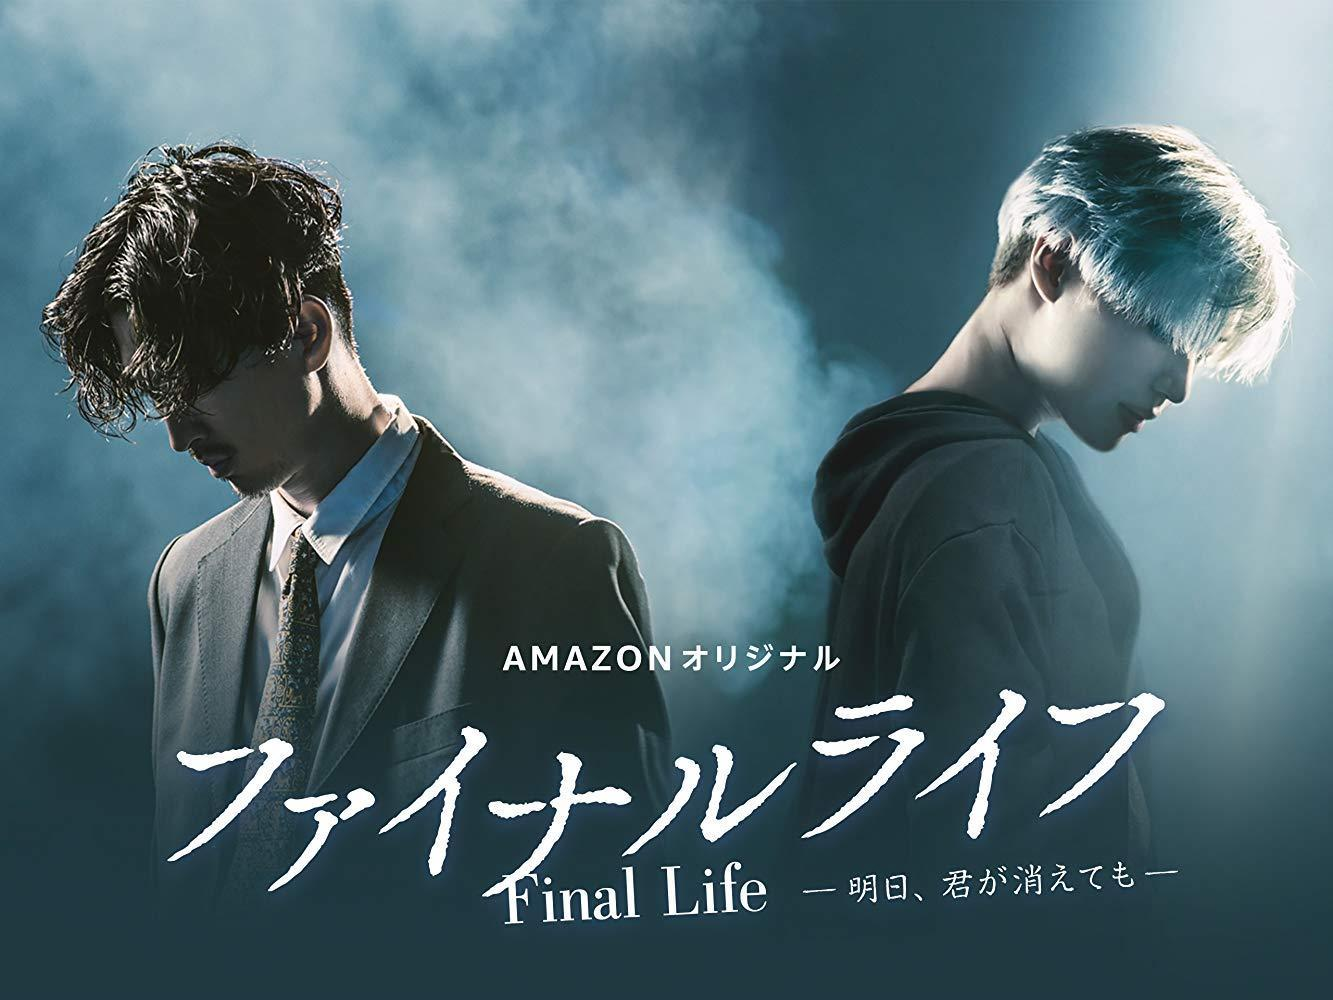 Final Life (TV Series) - Poster / Main Image